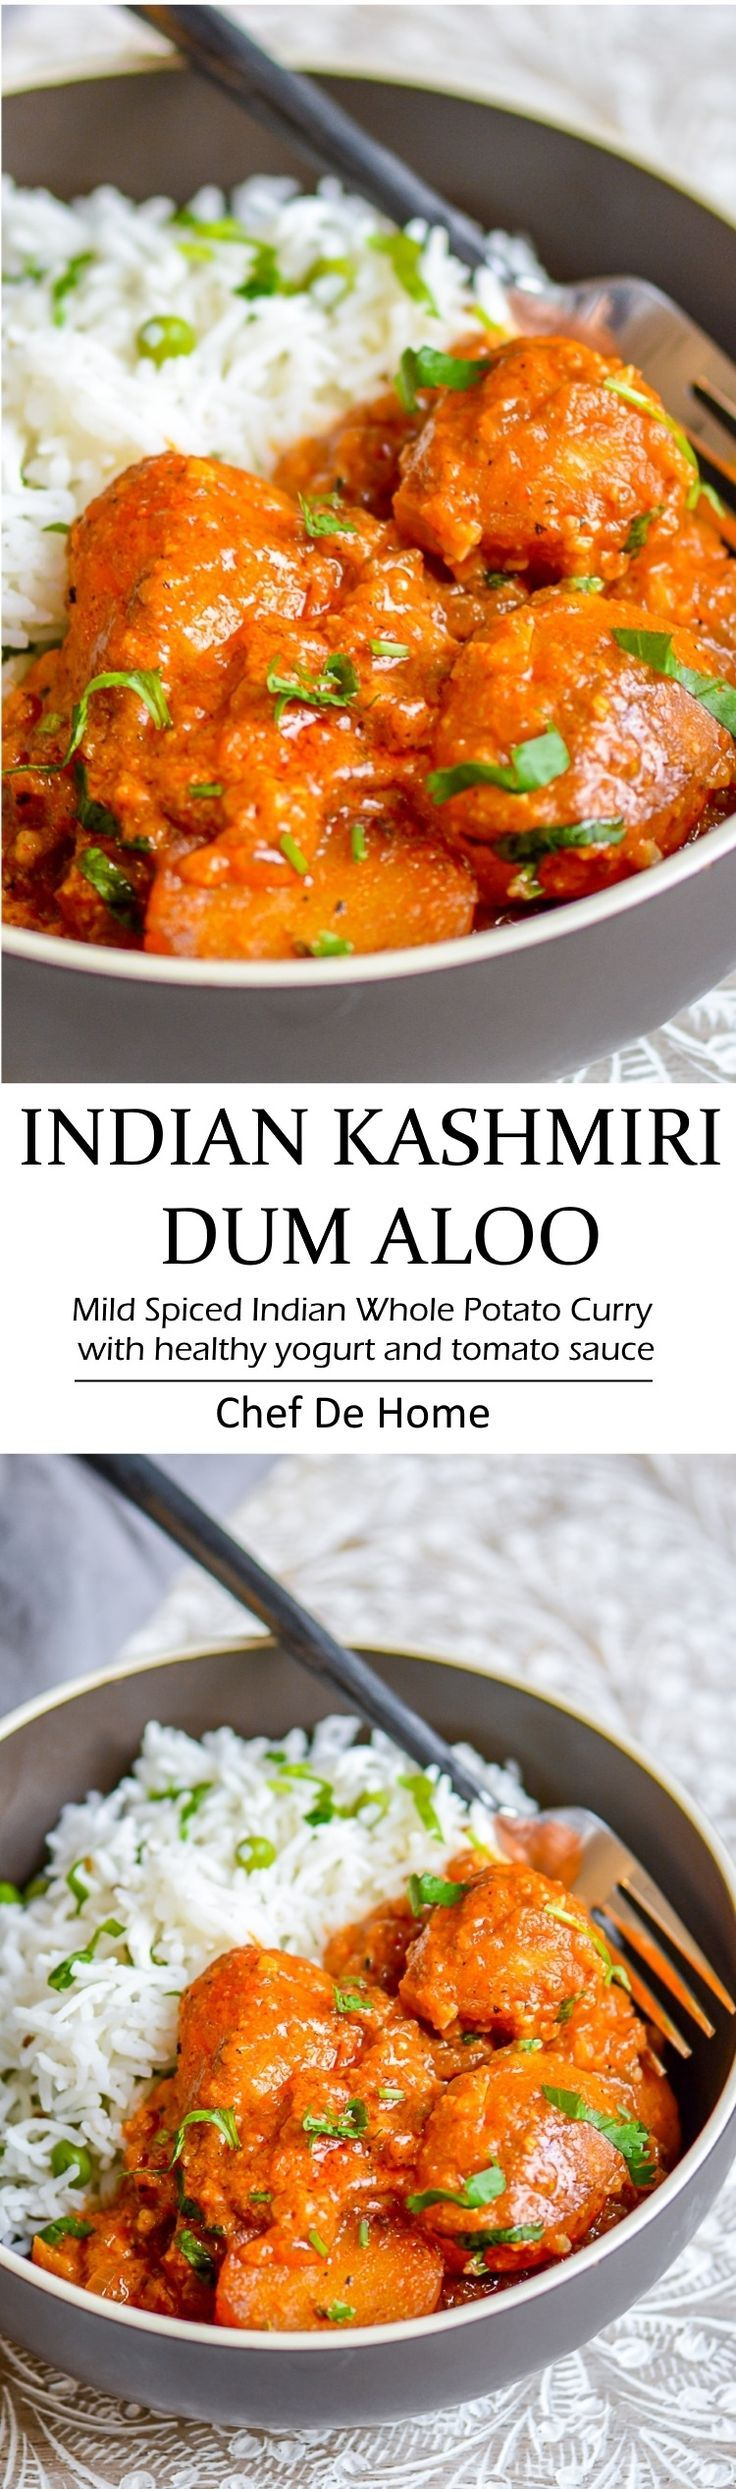 Authentic Kashmiri Dum Aloo Recipe | ChefDeHome.com, ,